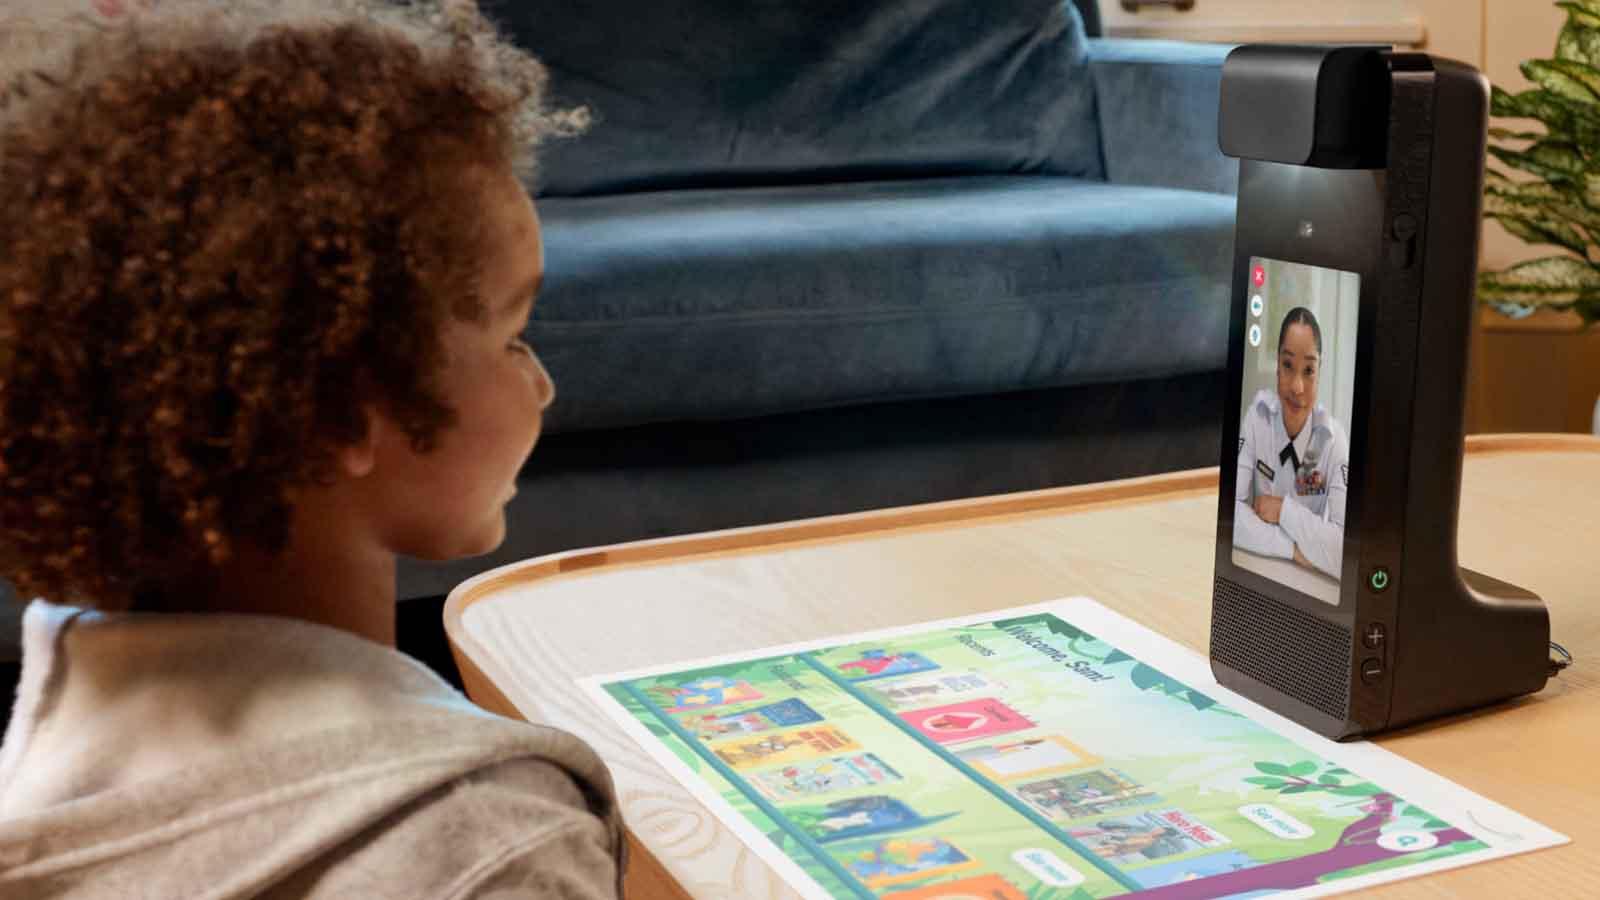 amazon glow screen for kids